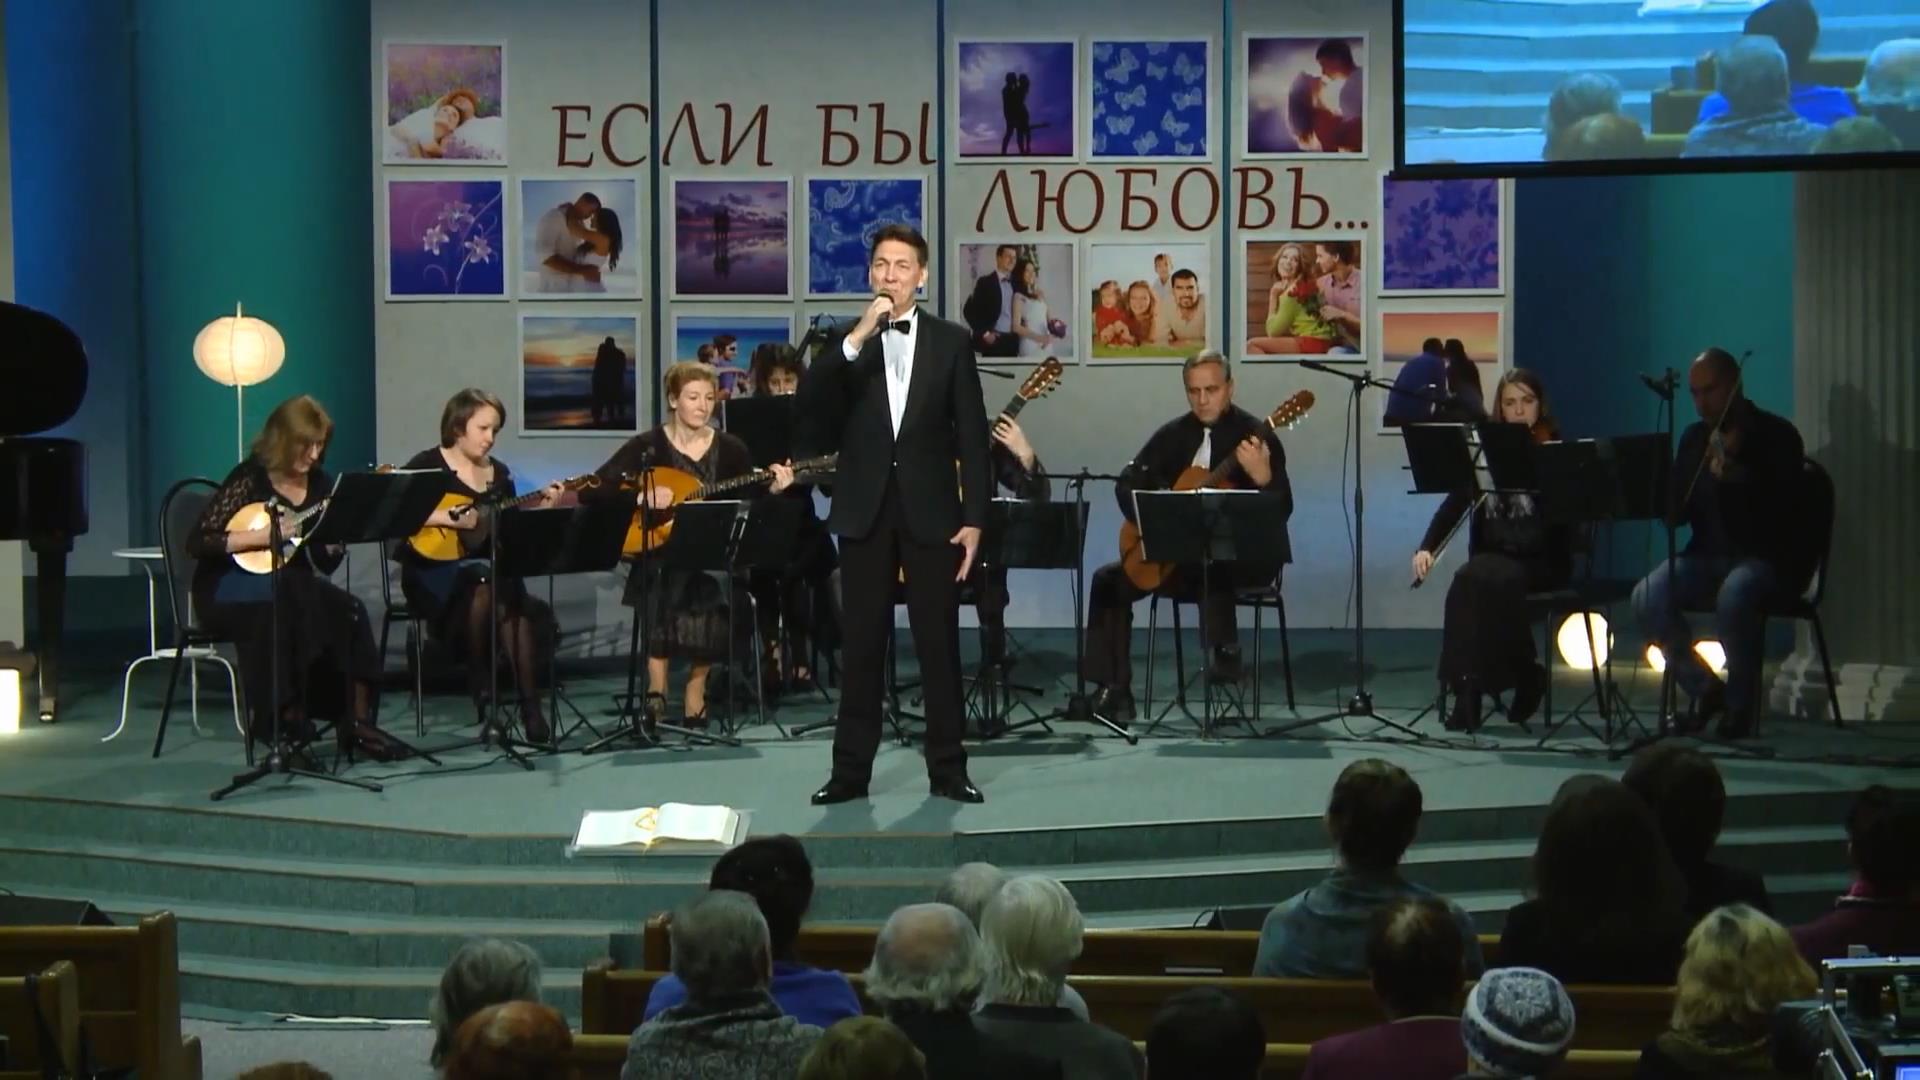 Евгений Бабин — «Благодарю».mp4_snapshot_01.57_[2016.03.28_13.41.39]